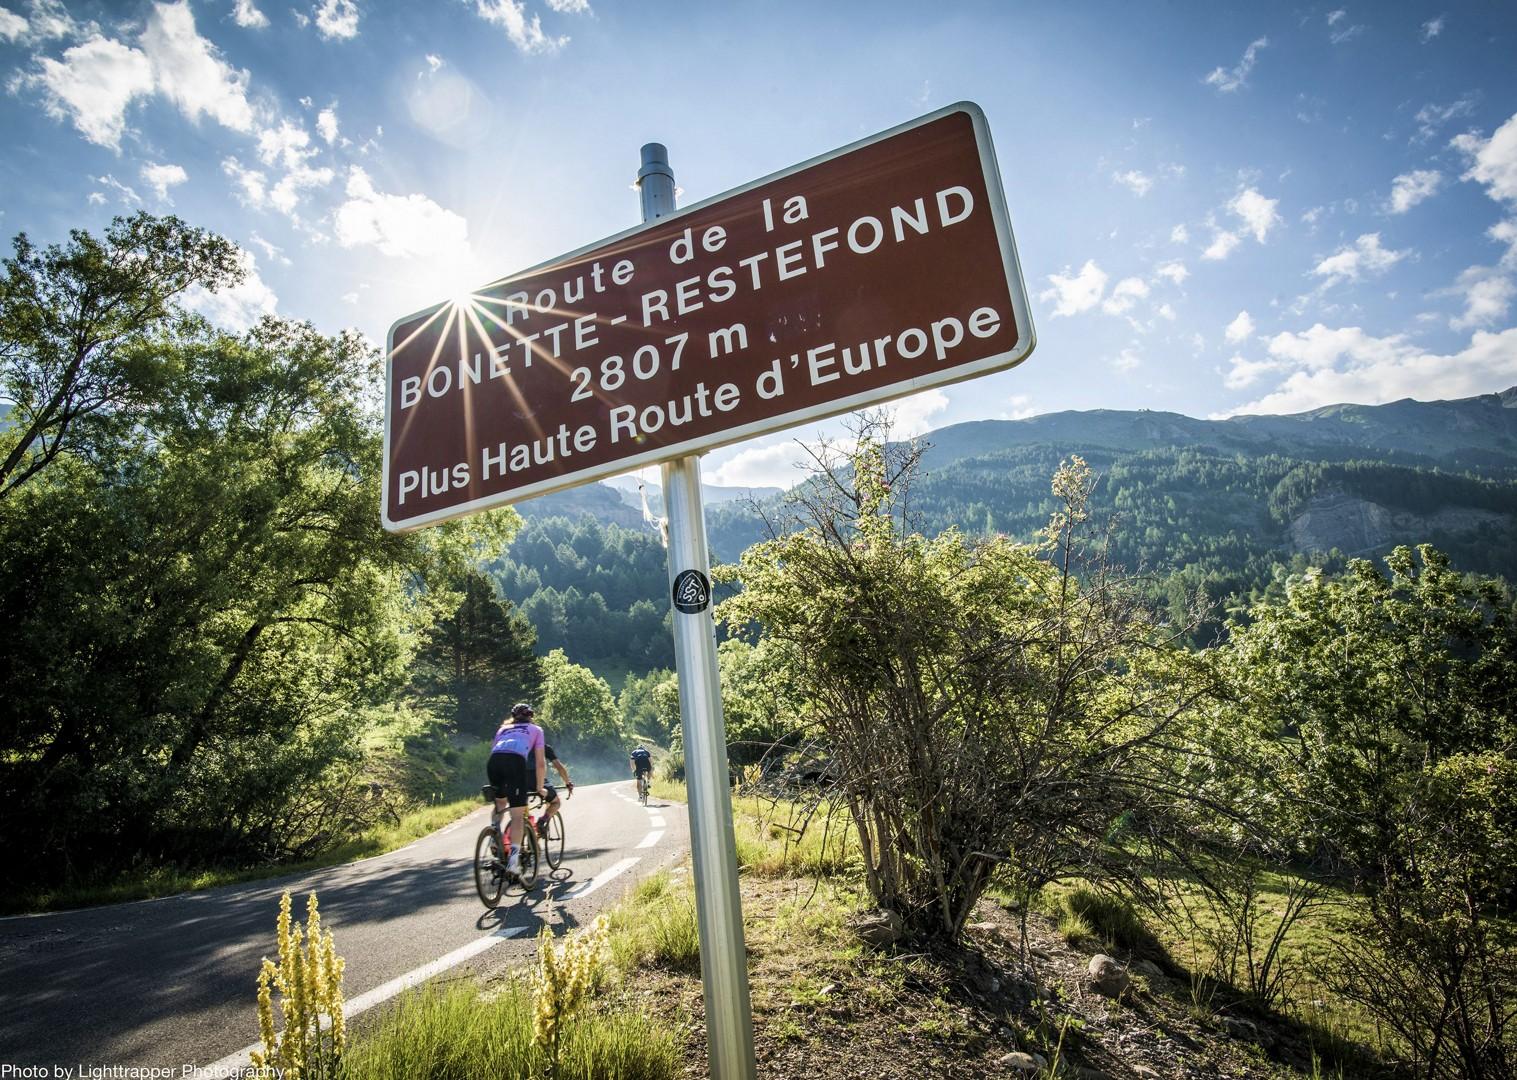 restefond-high-mountain-pass-france-raid-alpine-road-cycling-holiday.jpg - France - Raid Alpine - Guided Road Cycling Holiday - Road Cycling